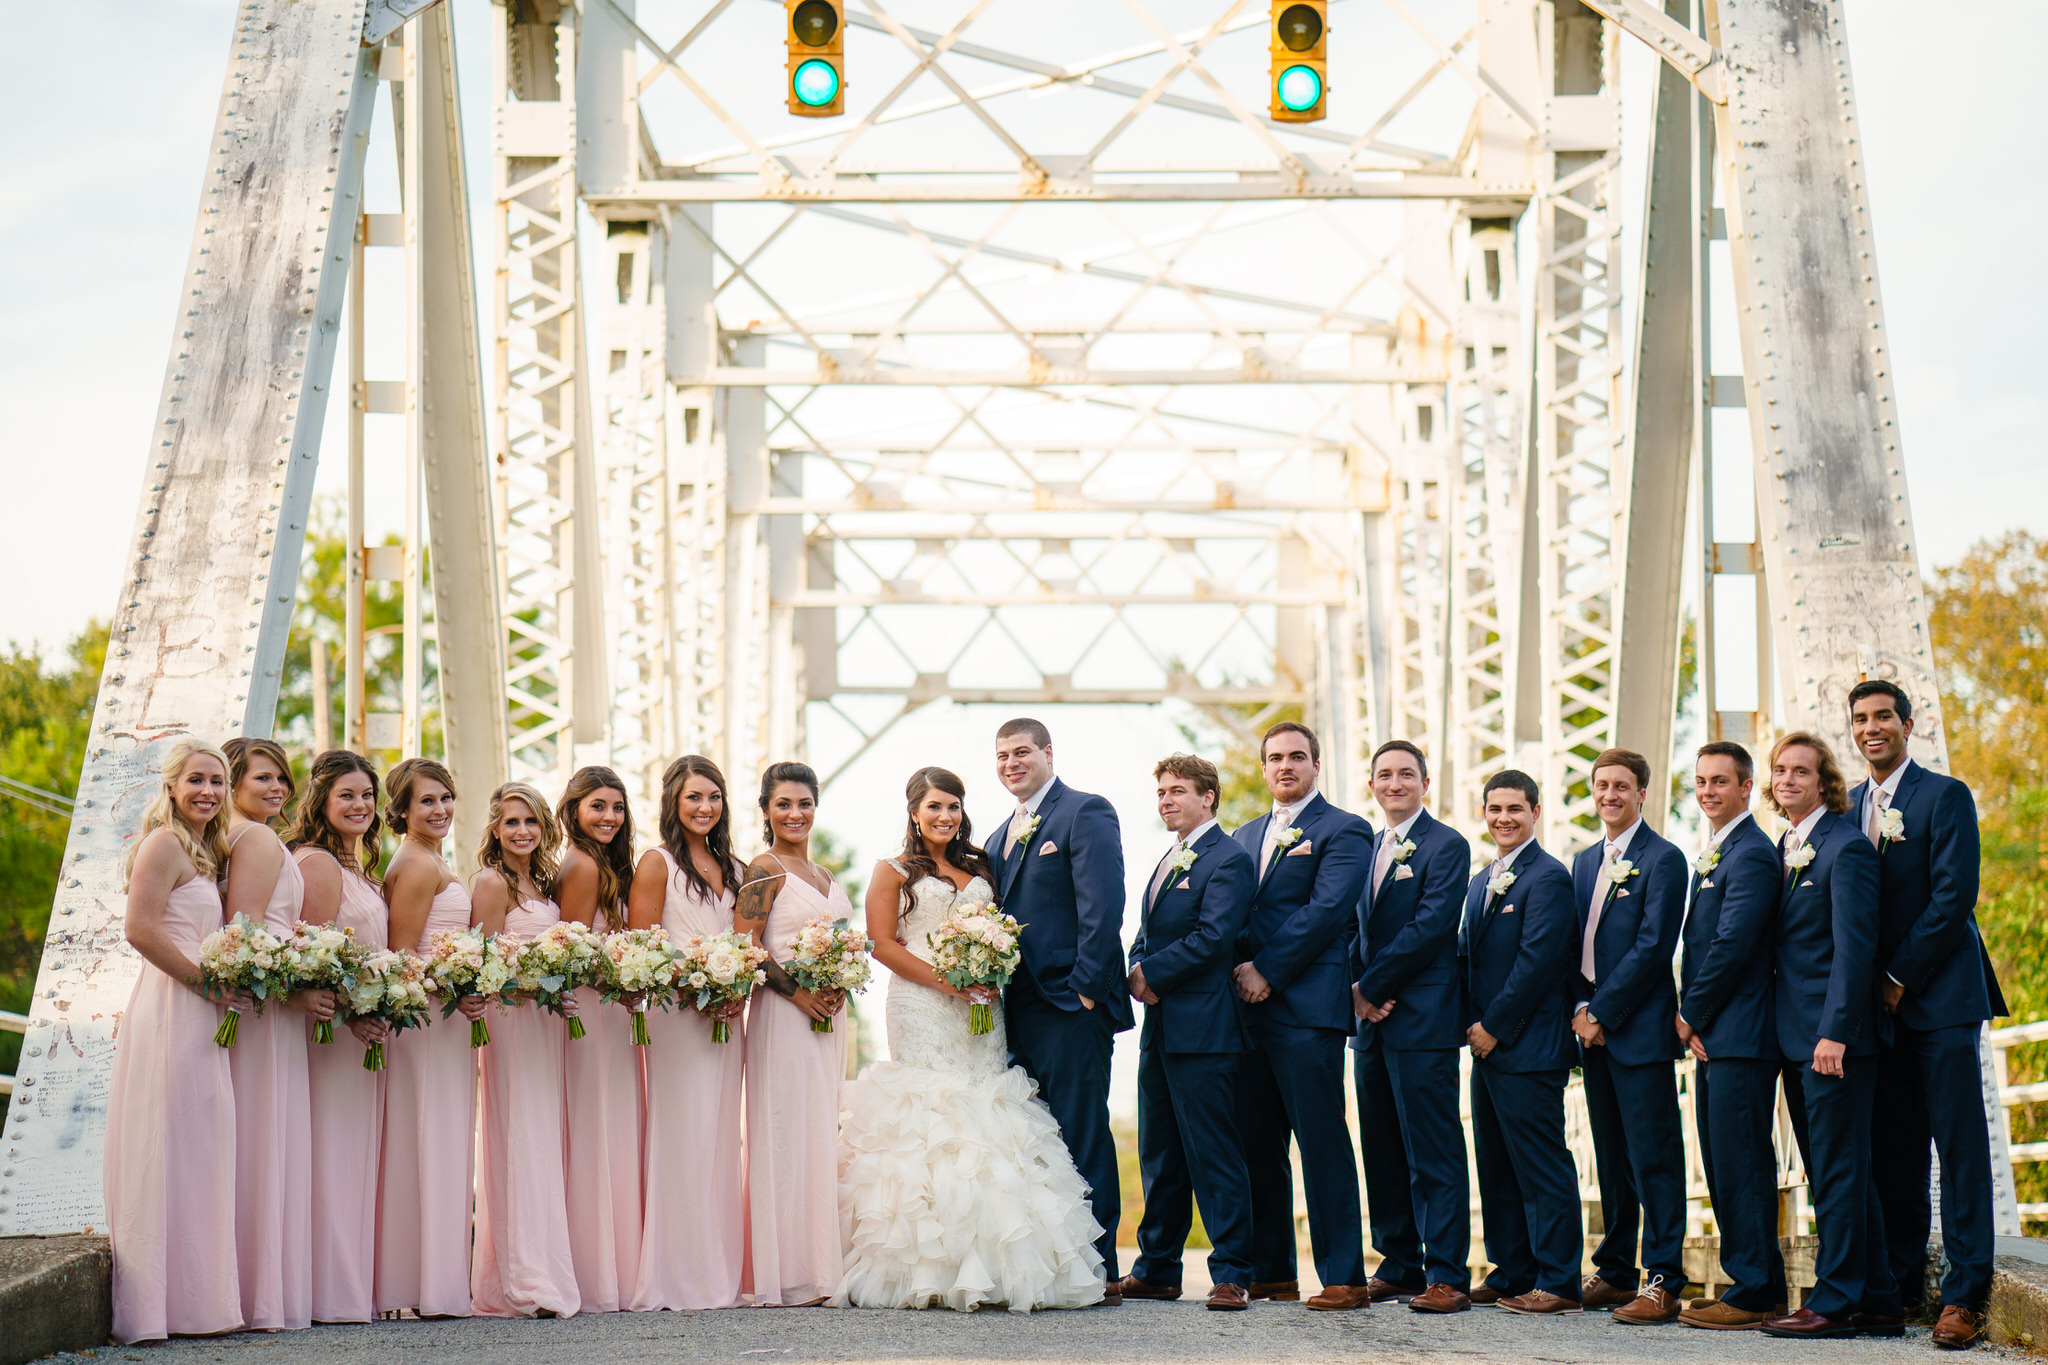 Angela-Andrew-Brooklyn-Arts-Wedding-Photography030.jpg